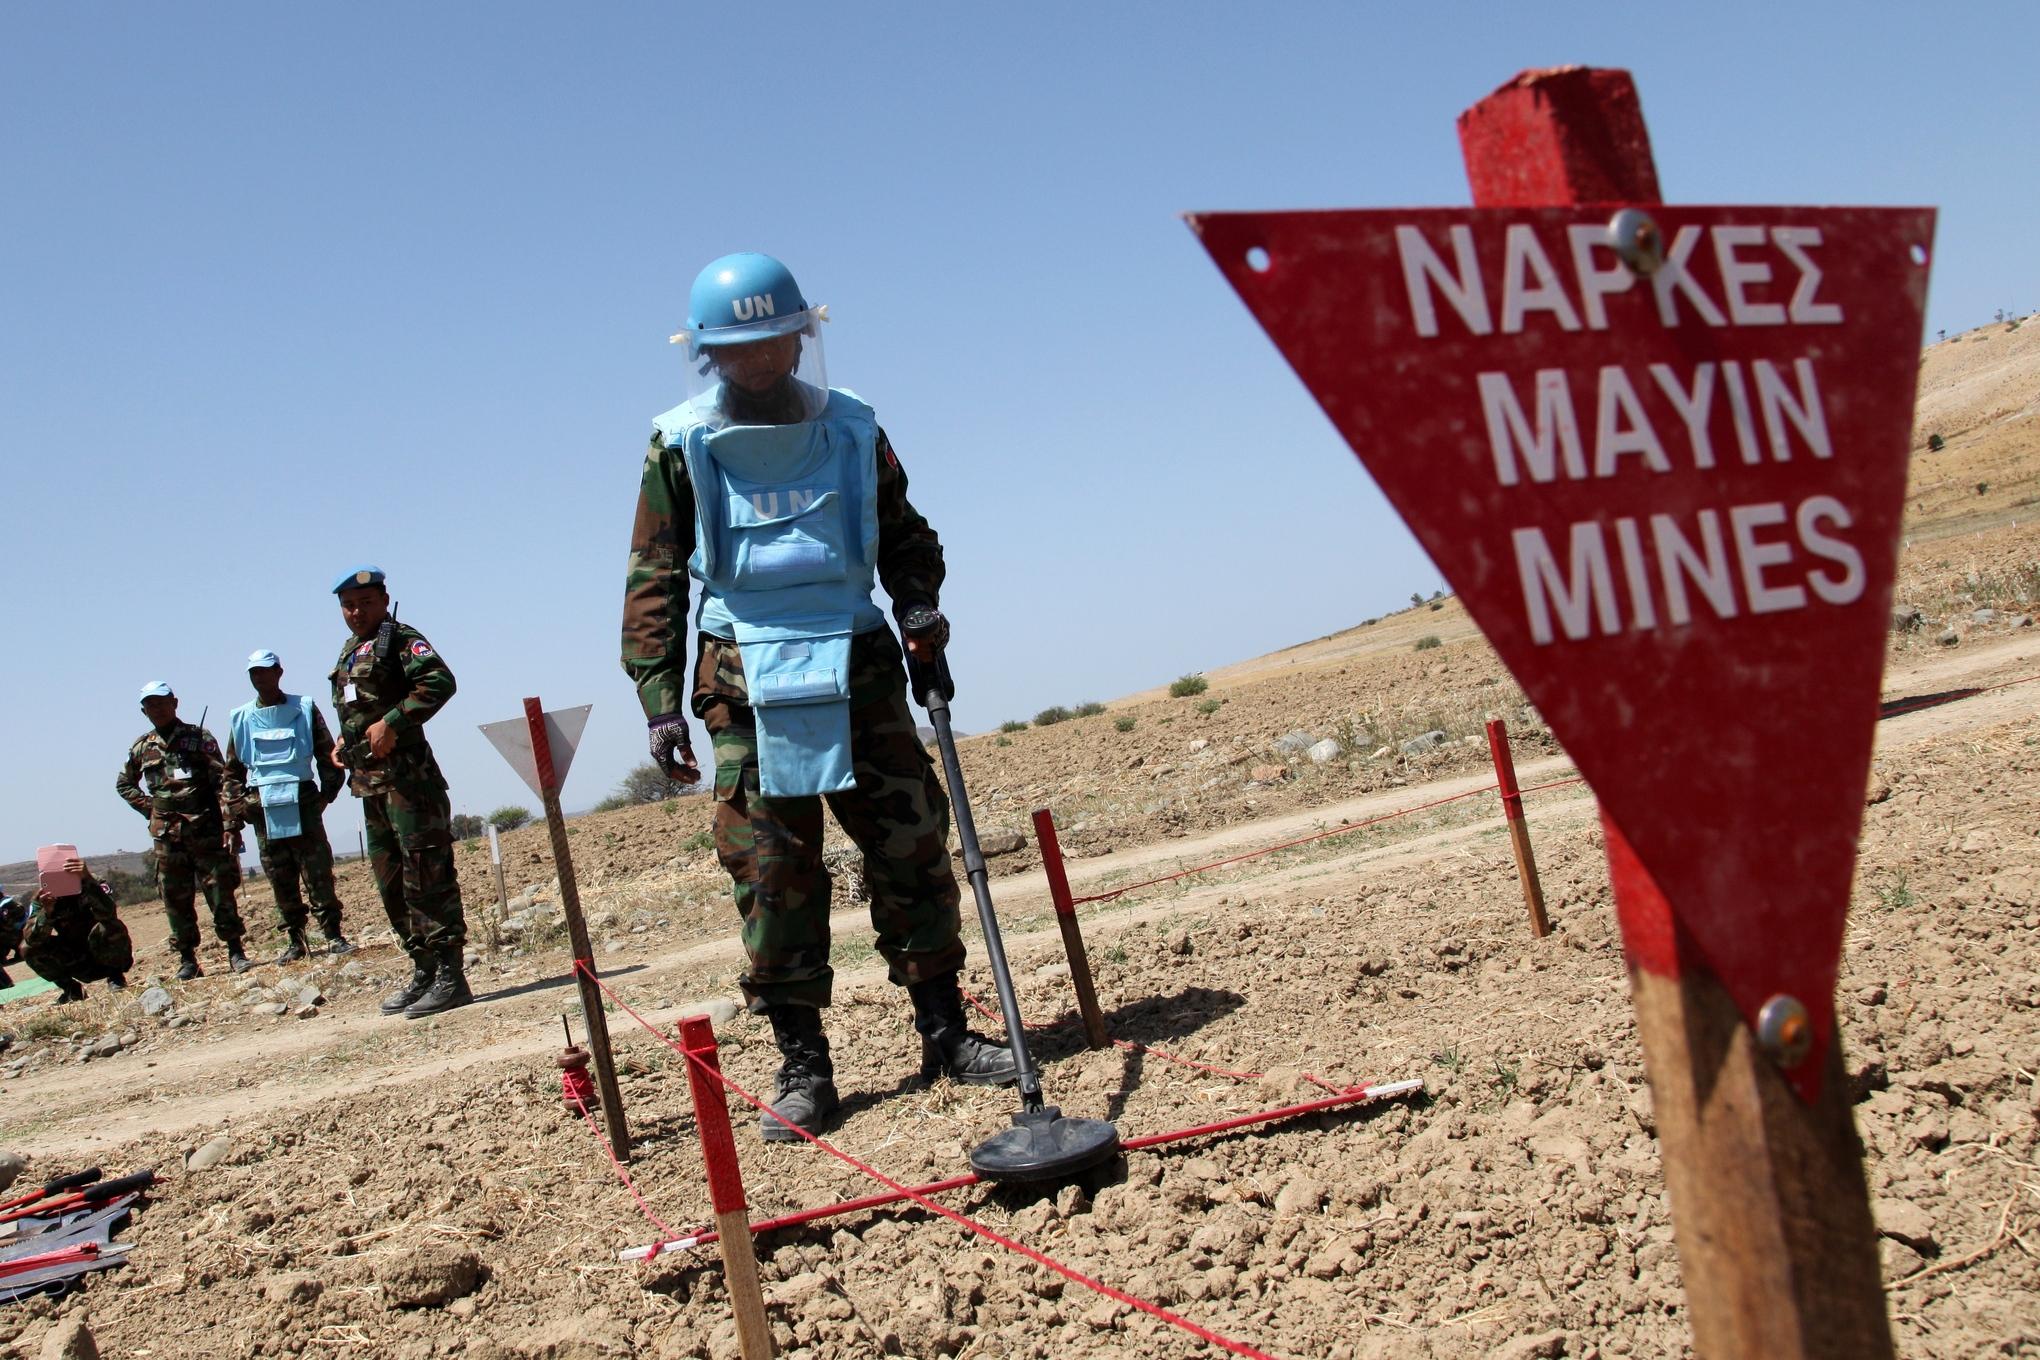 Landmines_2_barbara_laborde_afp_getty_images